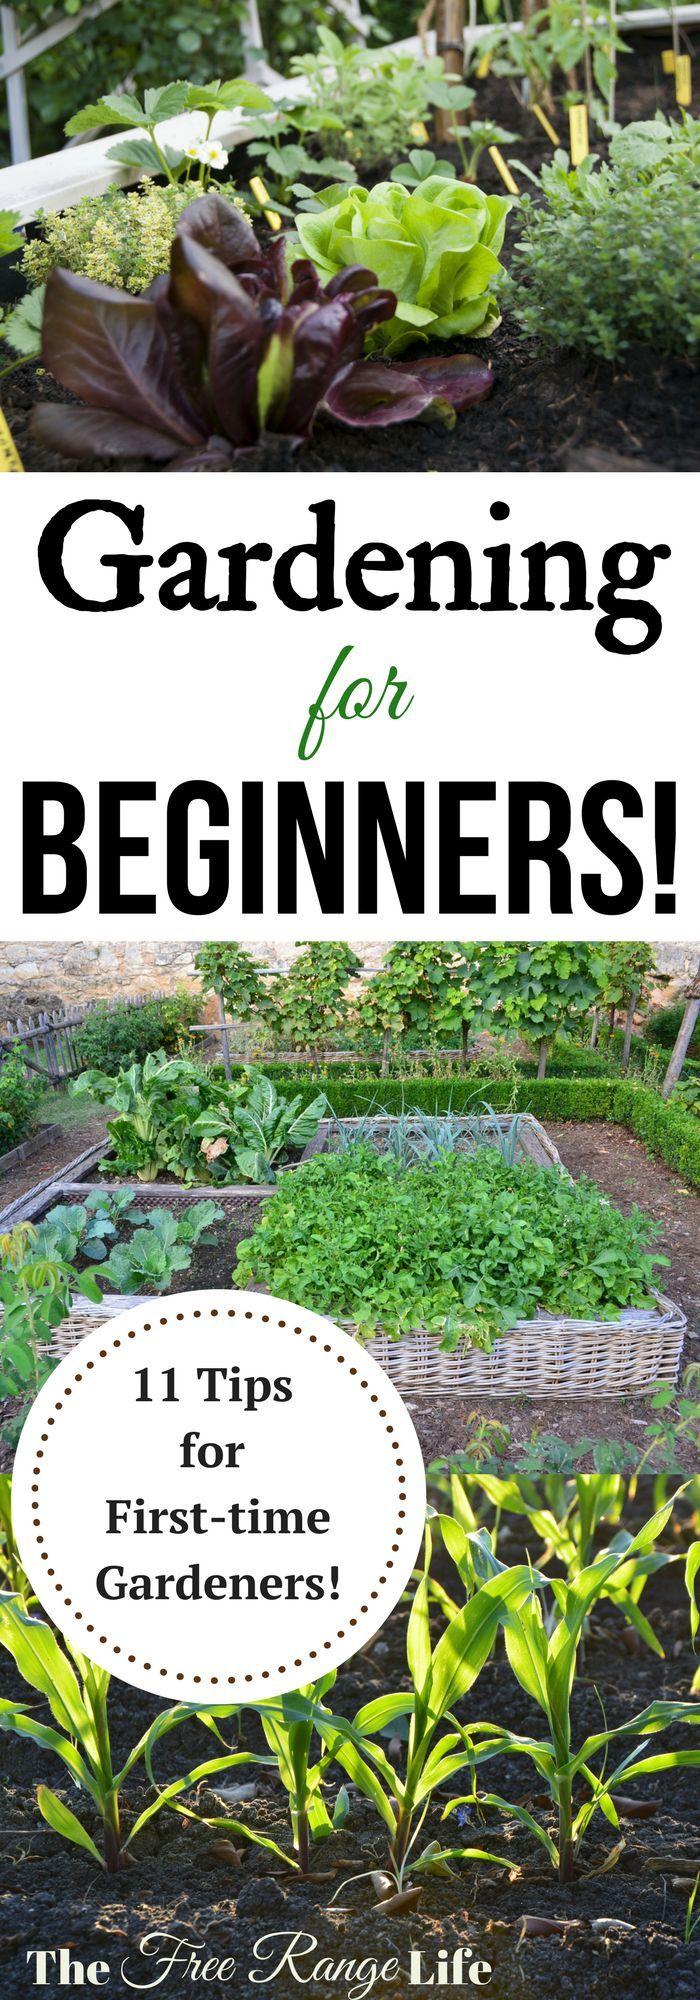 25 Best Ideas About Gardening For Beginners On Pinterest